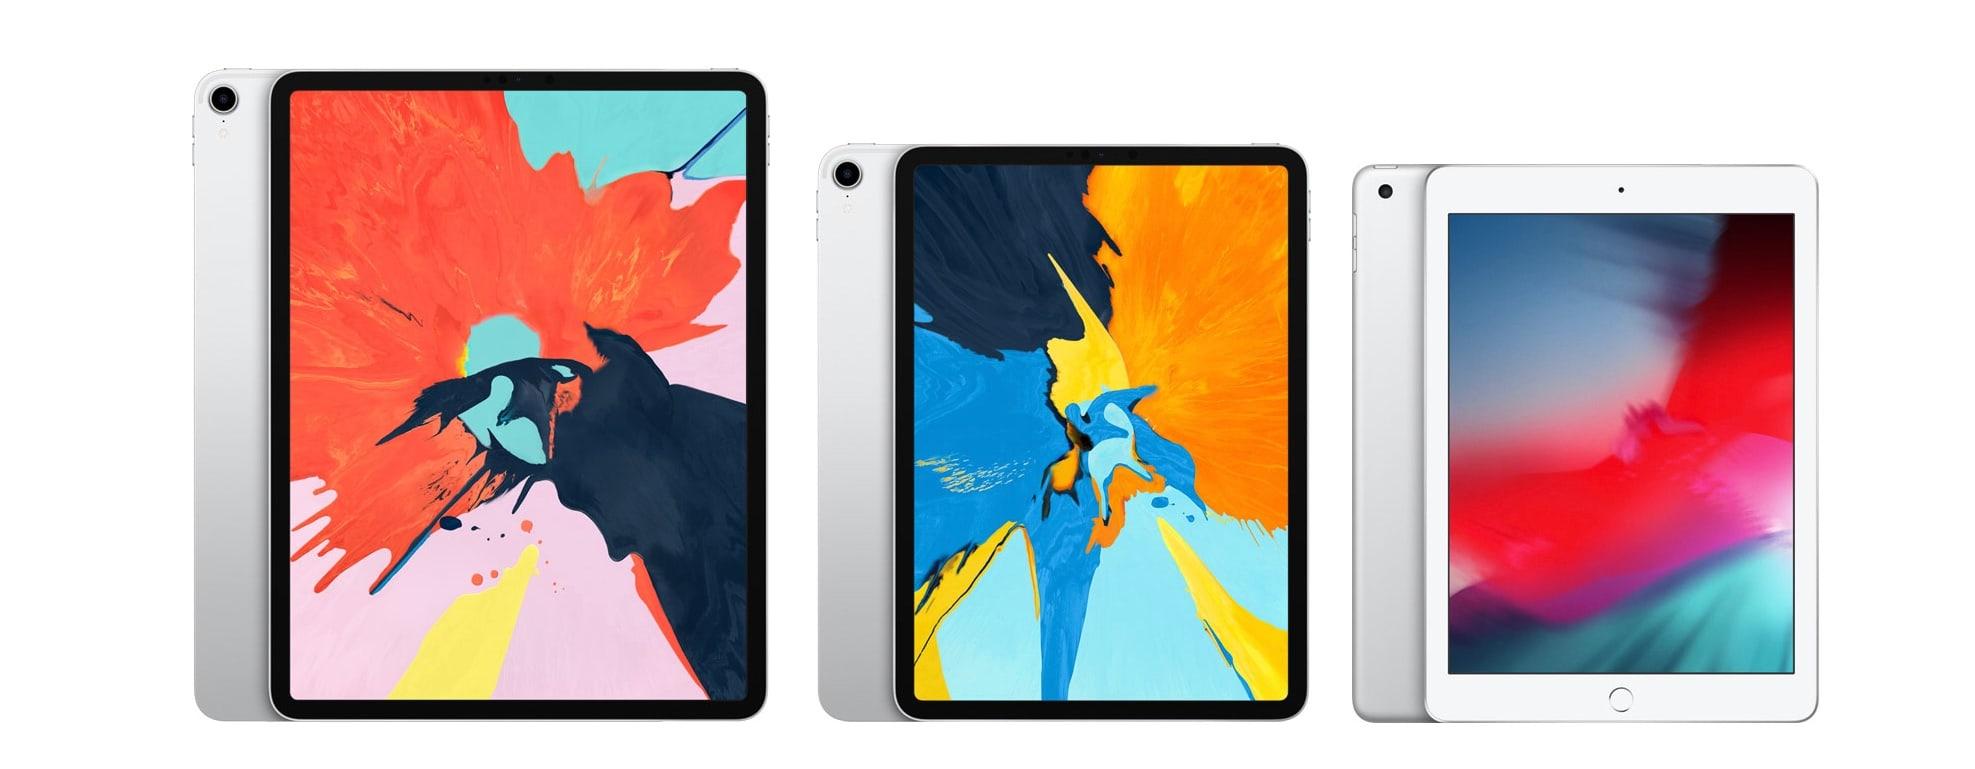 Expect iPad sales to start soon